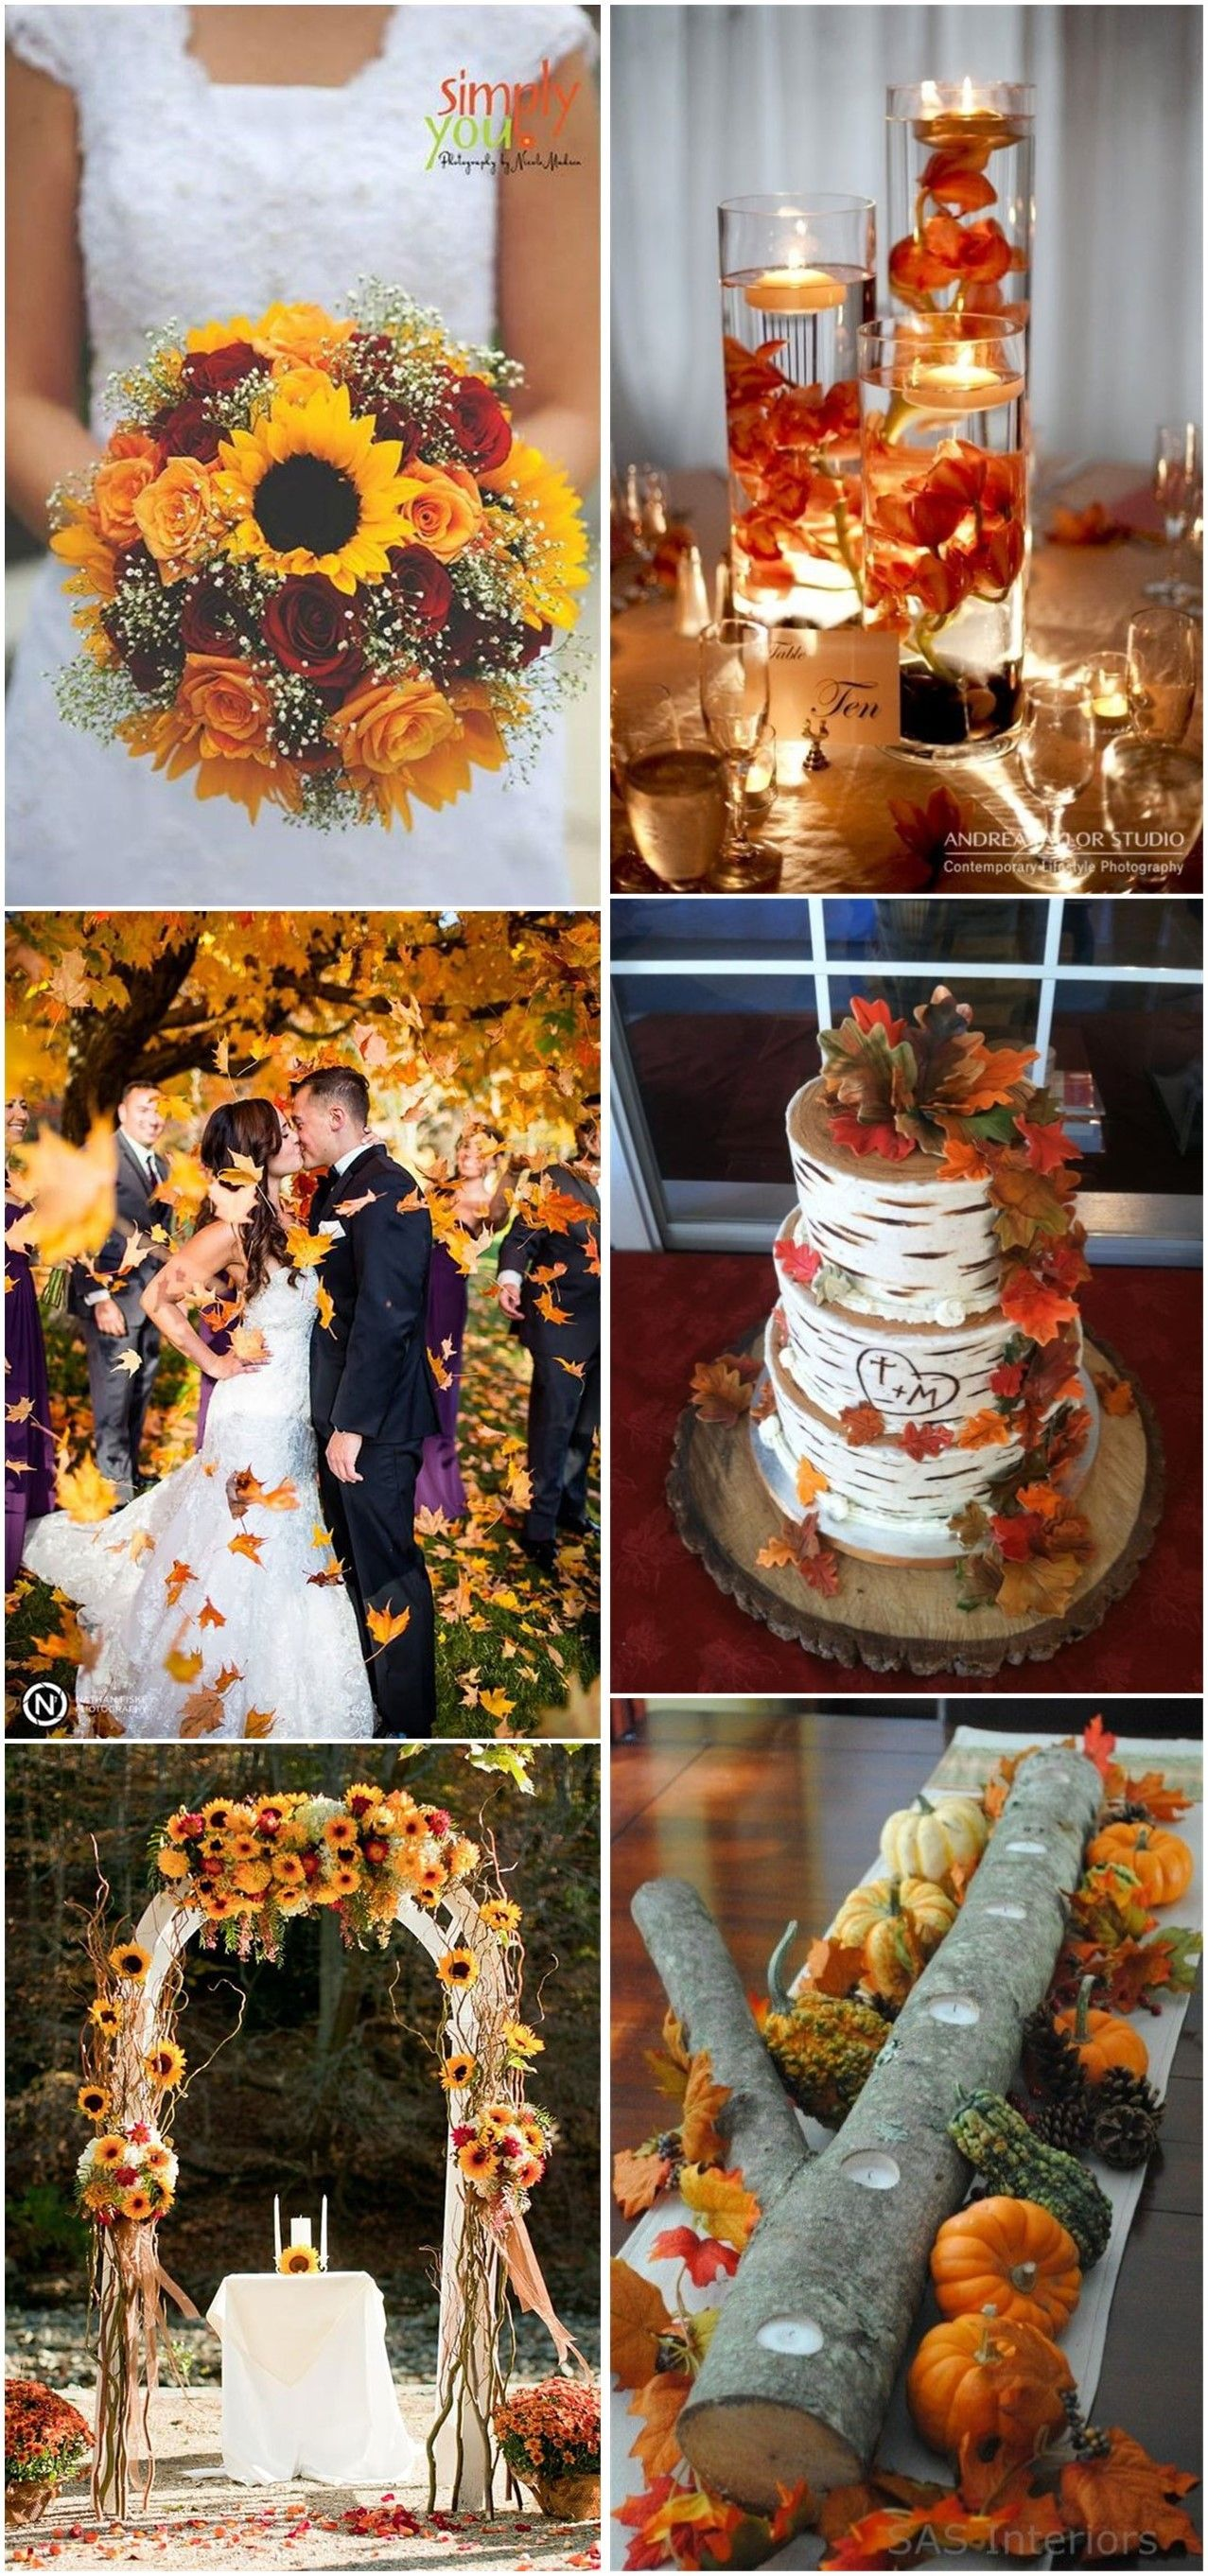 Wedding decorations reception ideas october 2018  Best Fall Wedding Ideas in   Wedding Wedding and Future